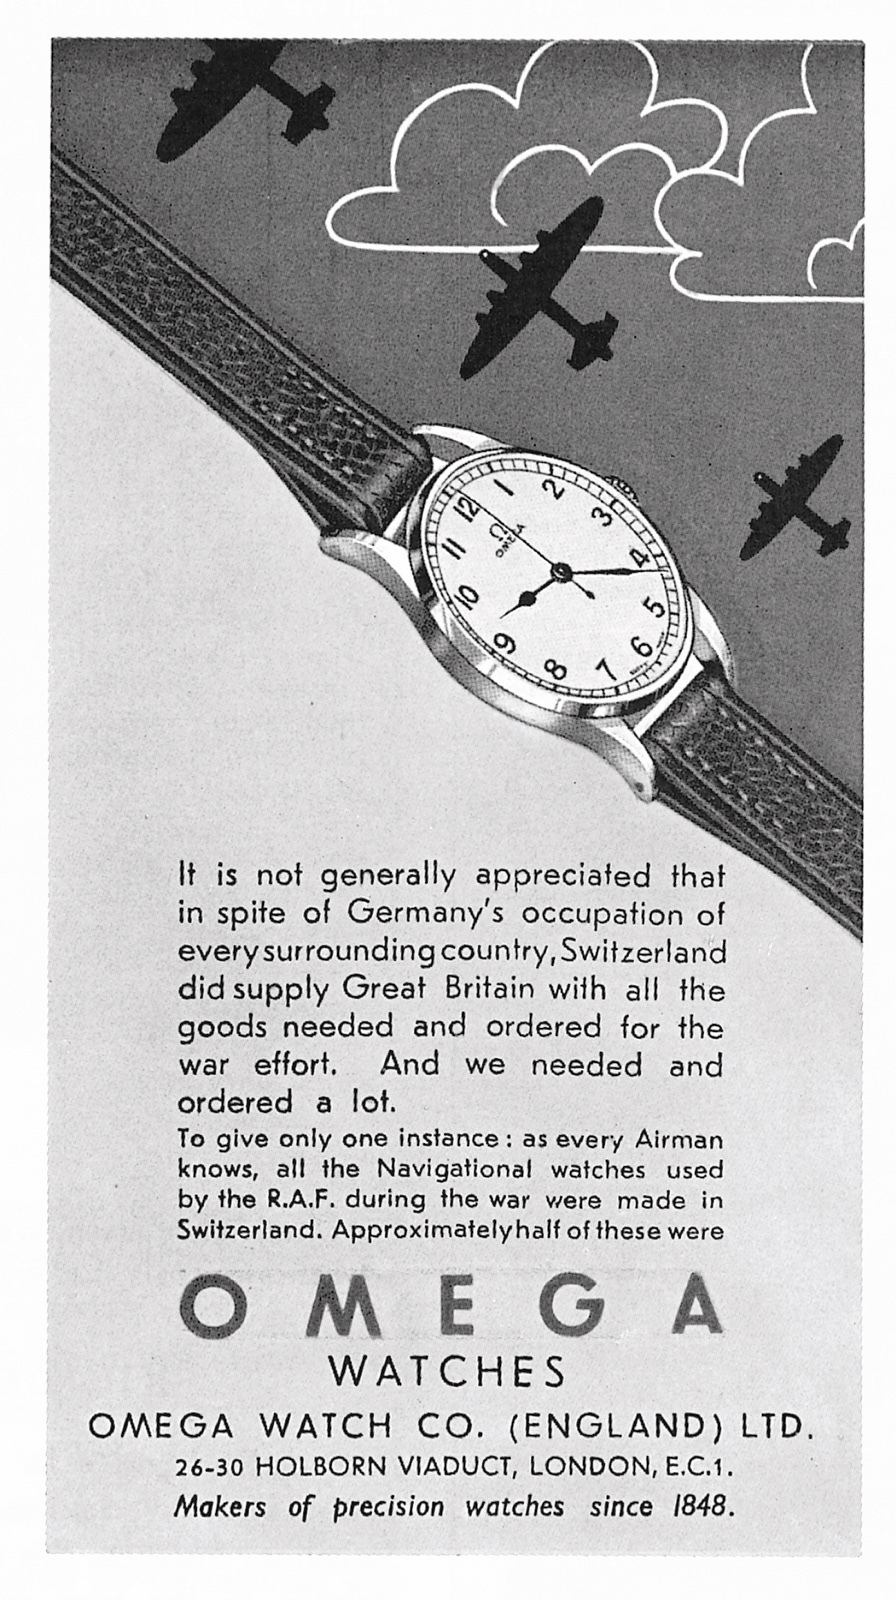 Omega-Publicidad 1945